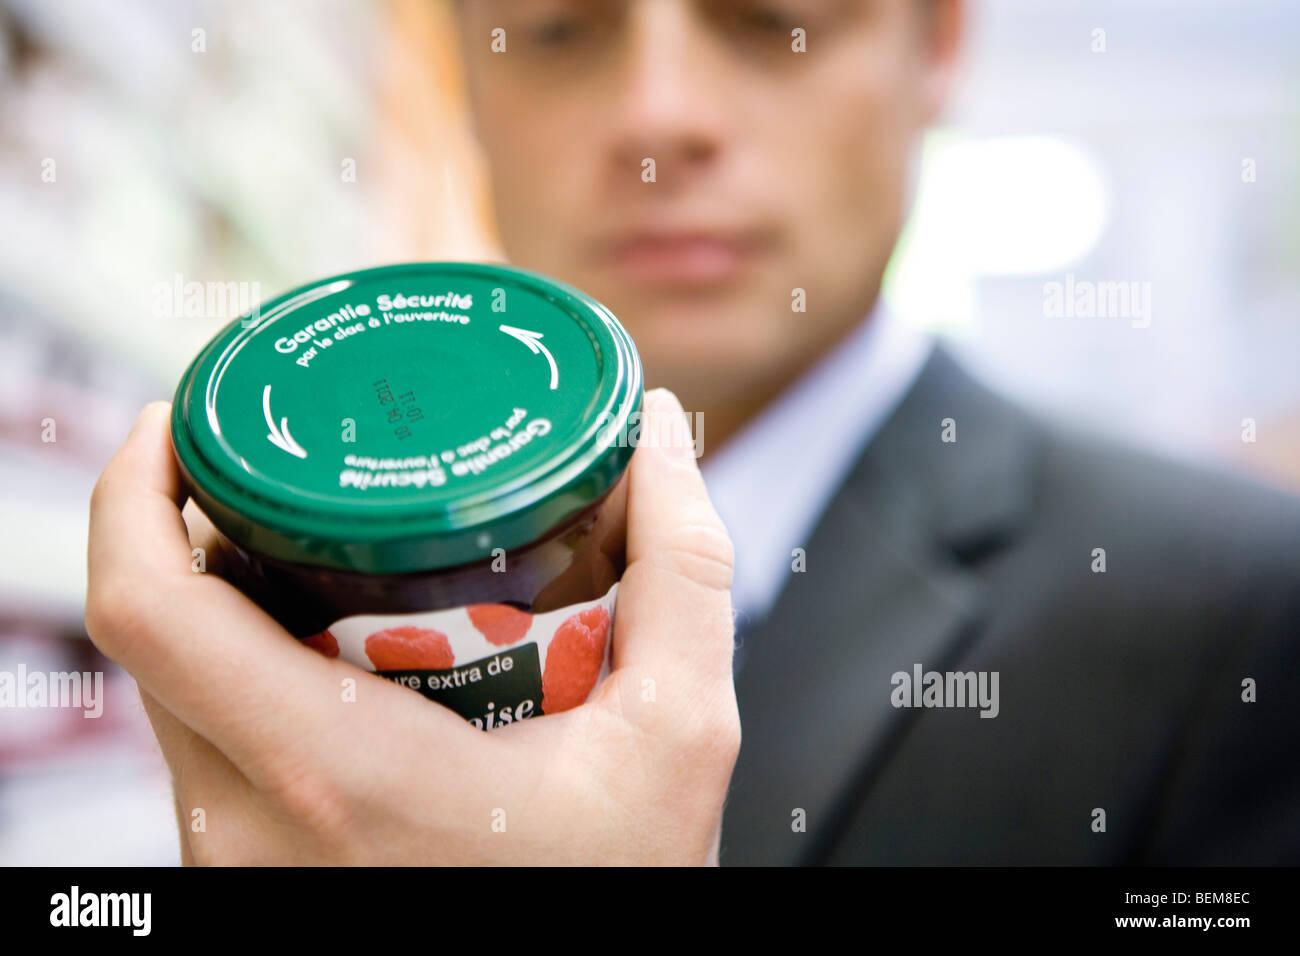 Man reading label on jar of jam - Stock Image